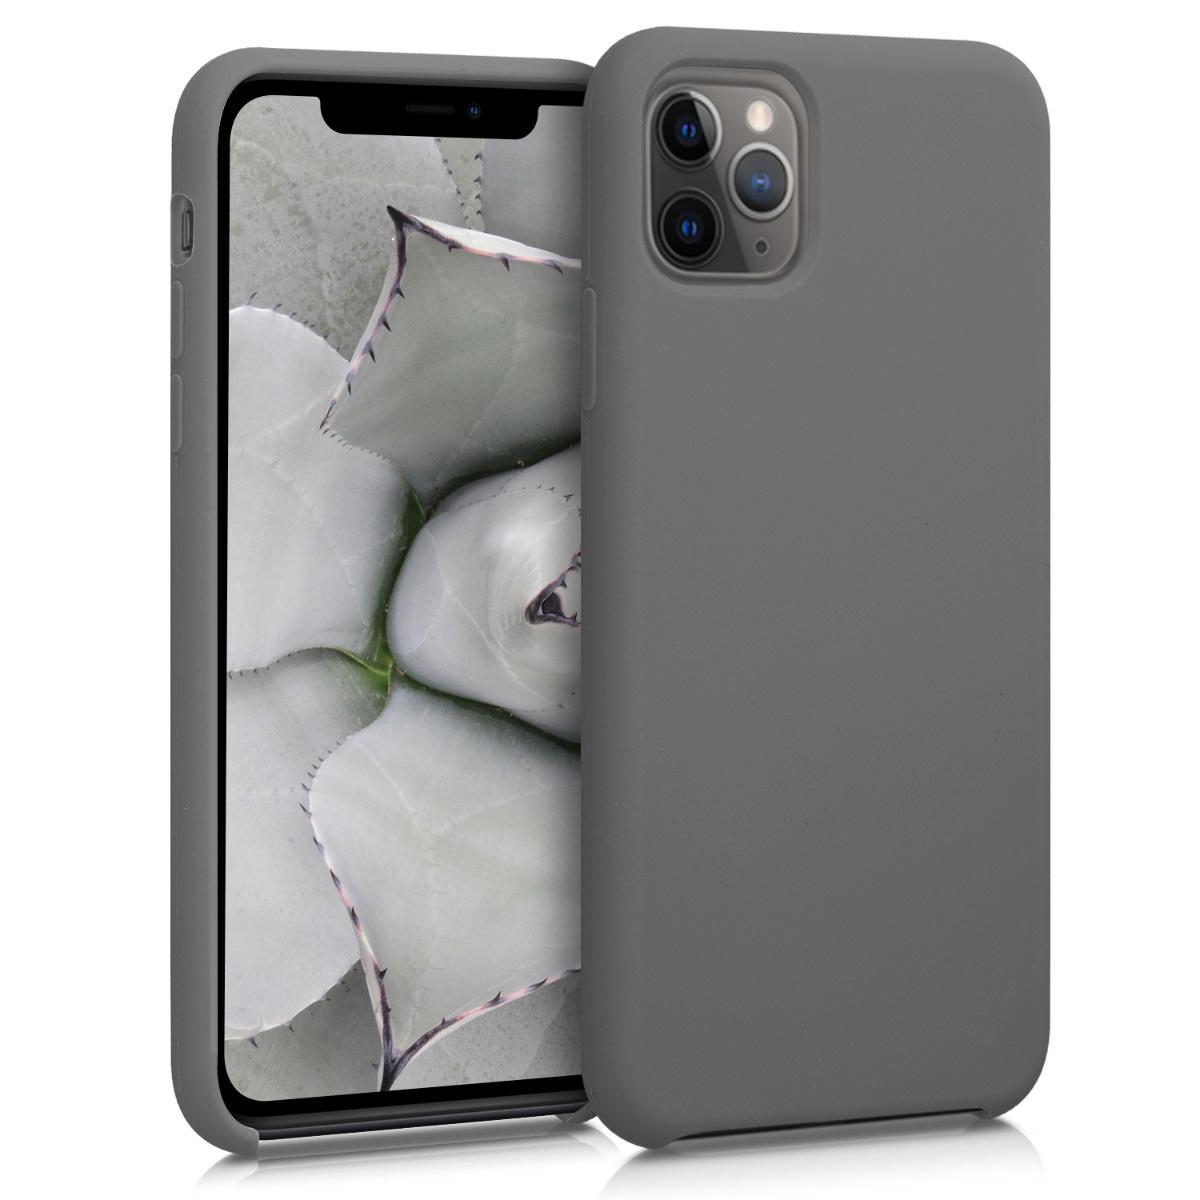 KW Θήκη Σιλικόνης Apple iPhone 11 Pro Max - Soft Flexible Rubber - Titanium Grey (49725.155)